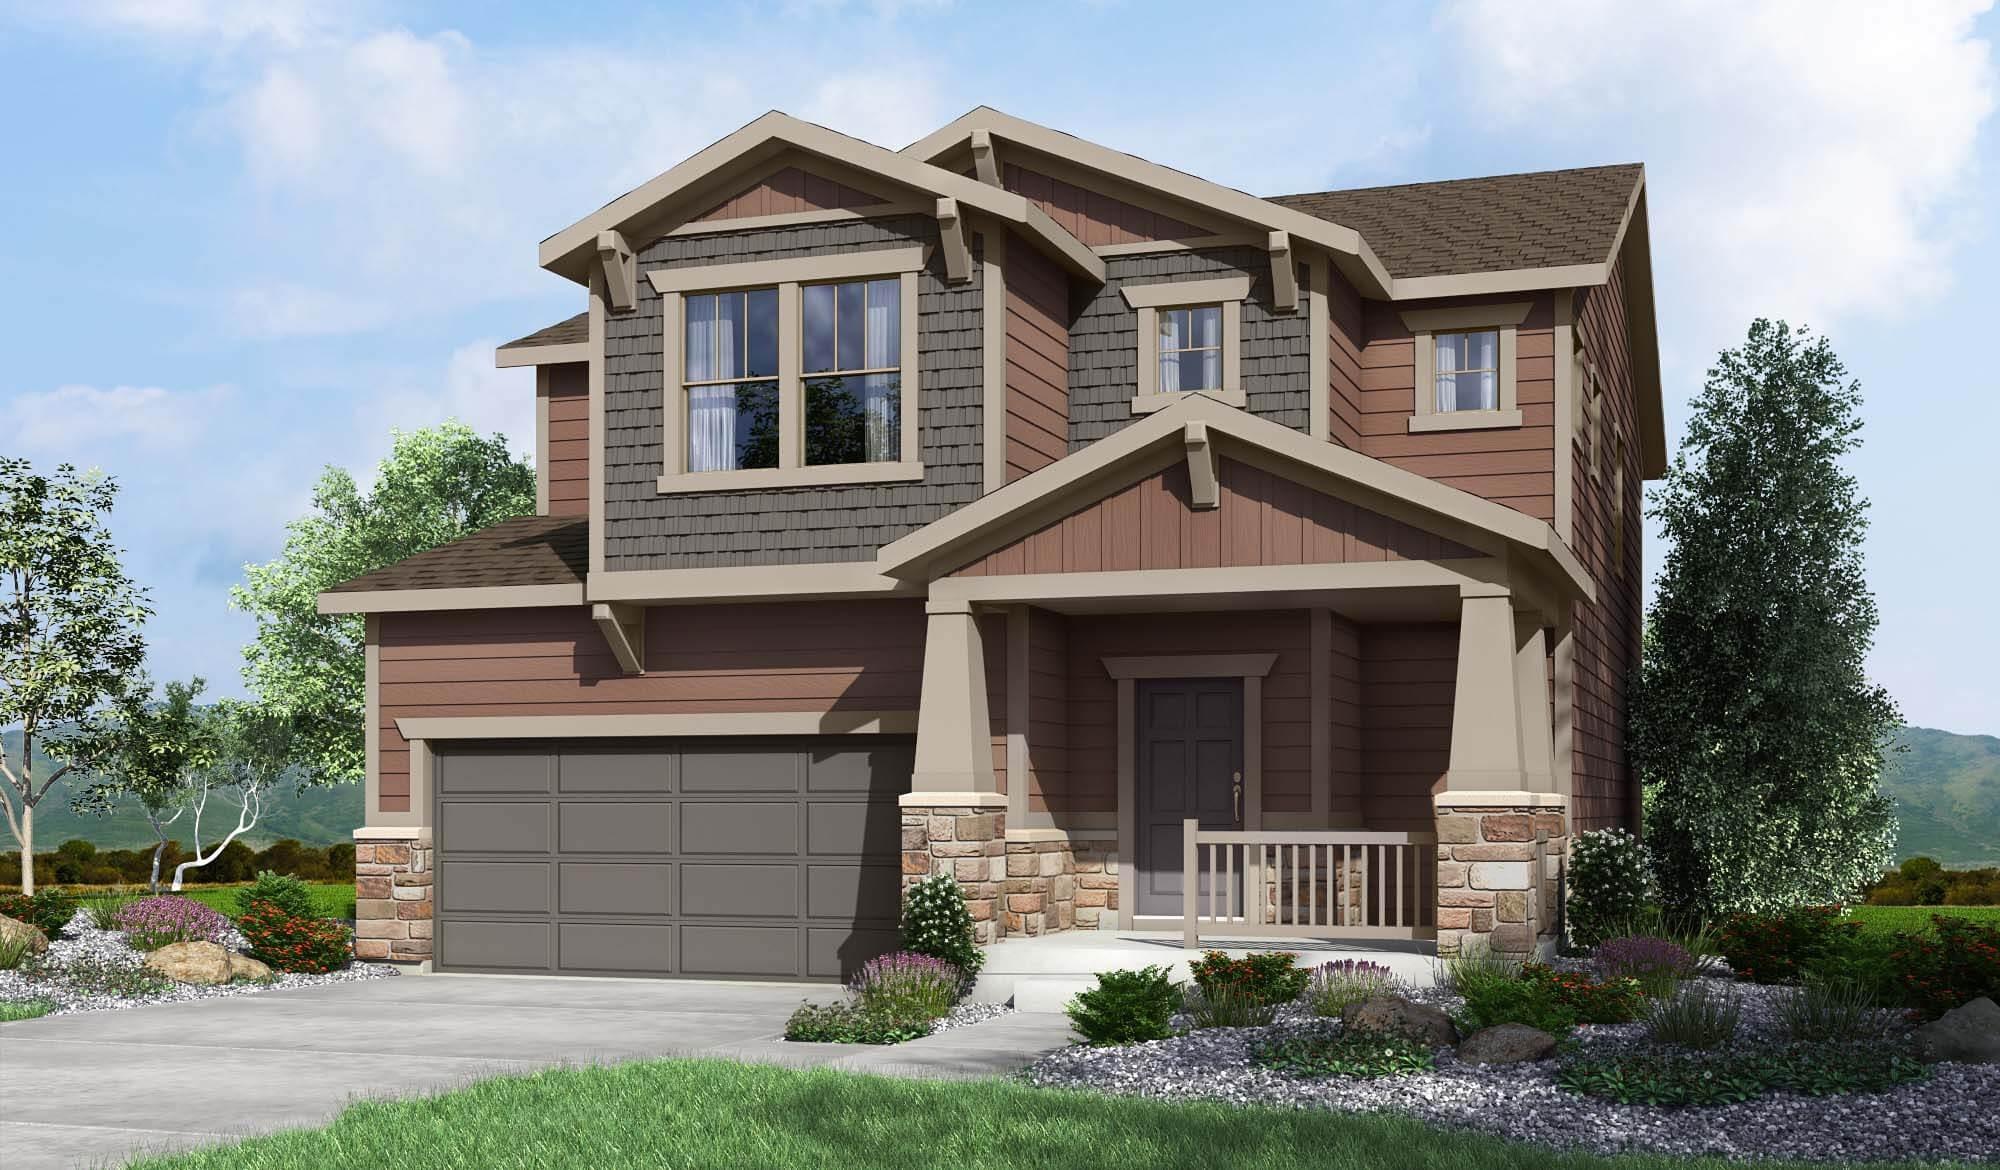 A52269_Village_Homes_Denver_Connection_35s_35C4_B__CRAFTSMAN_4_HERO20170509135722